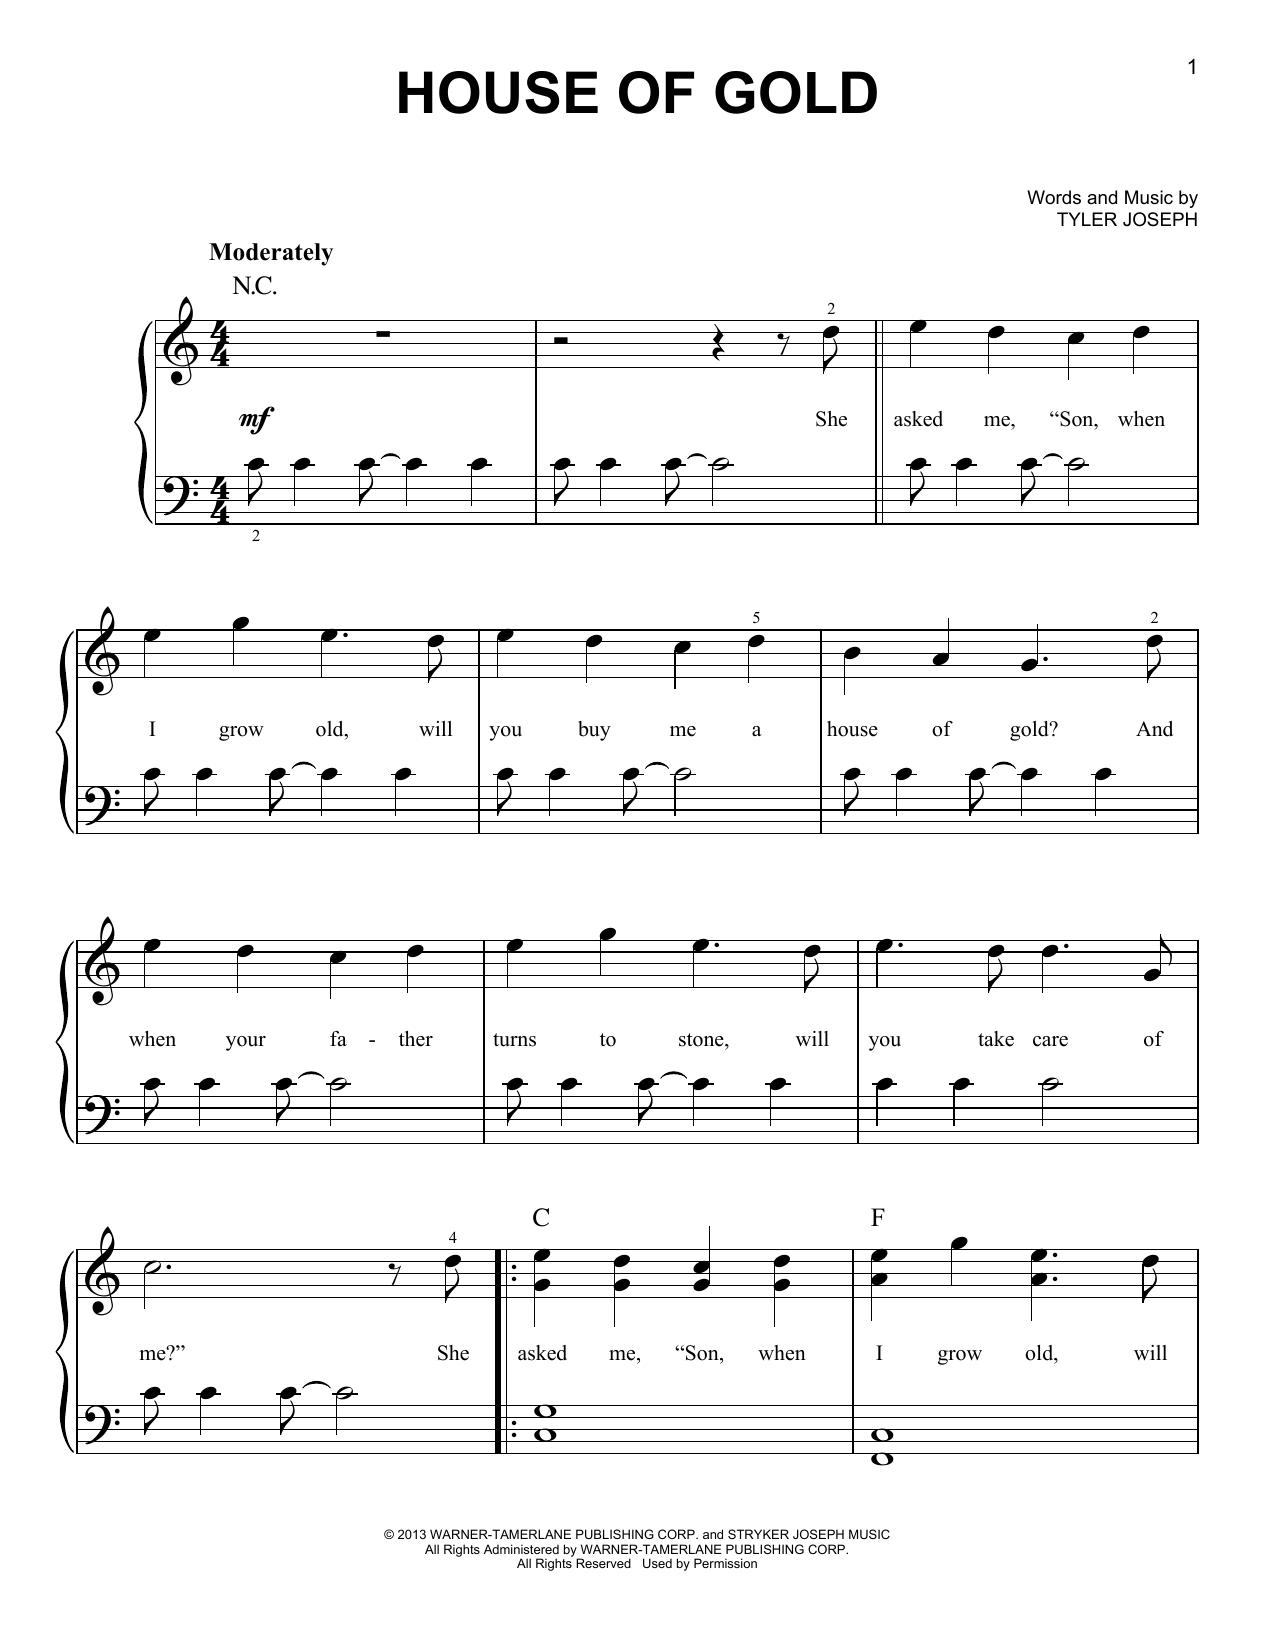 House Of Gold Ukulele Chords Sheet Music Digital Files To Print Licensed Tyler Joseph Digital